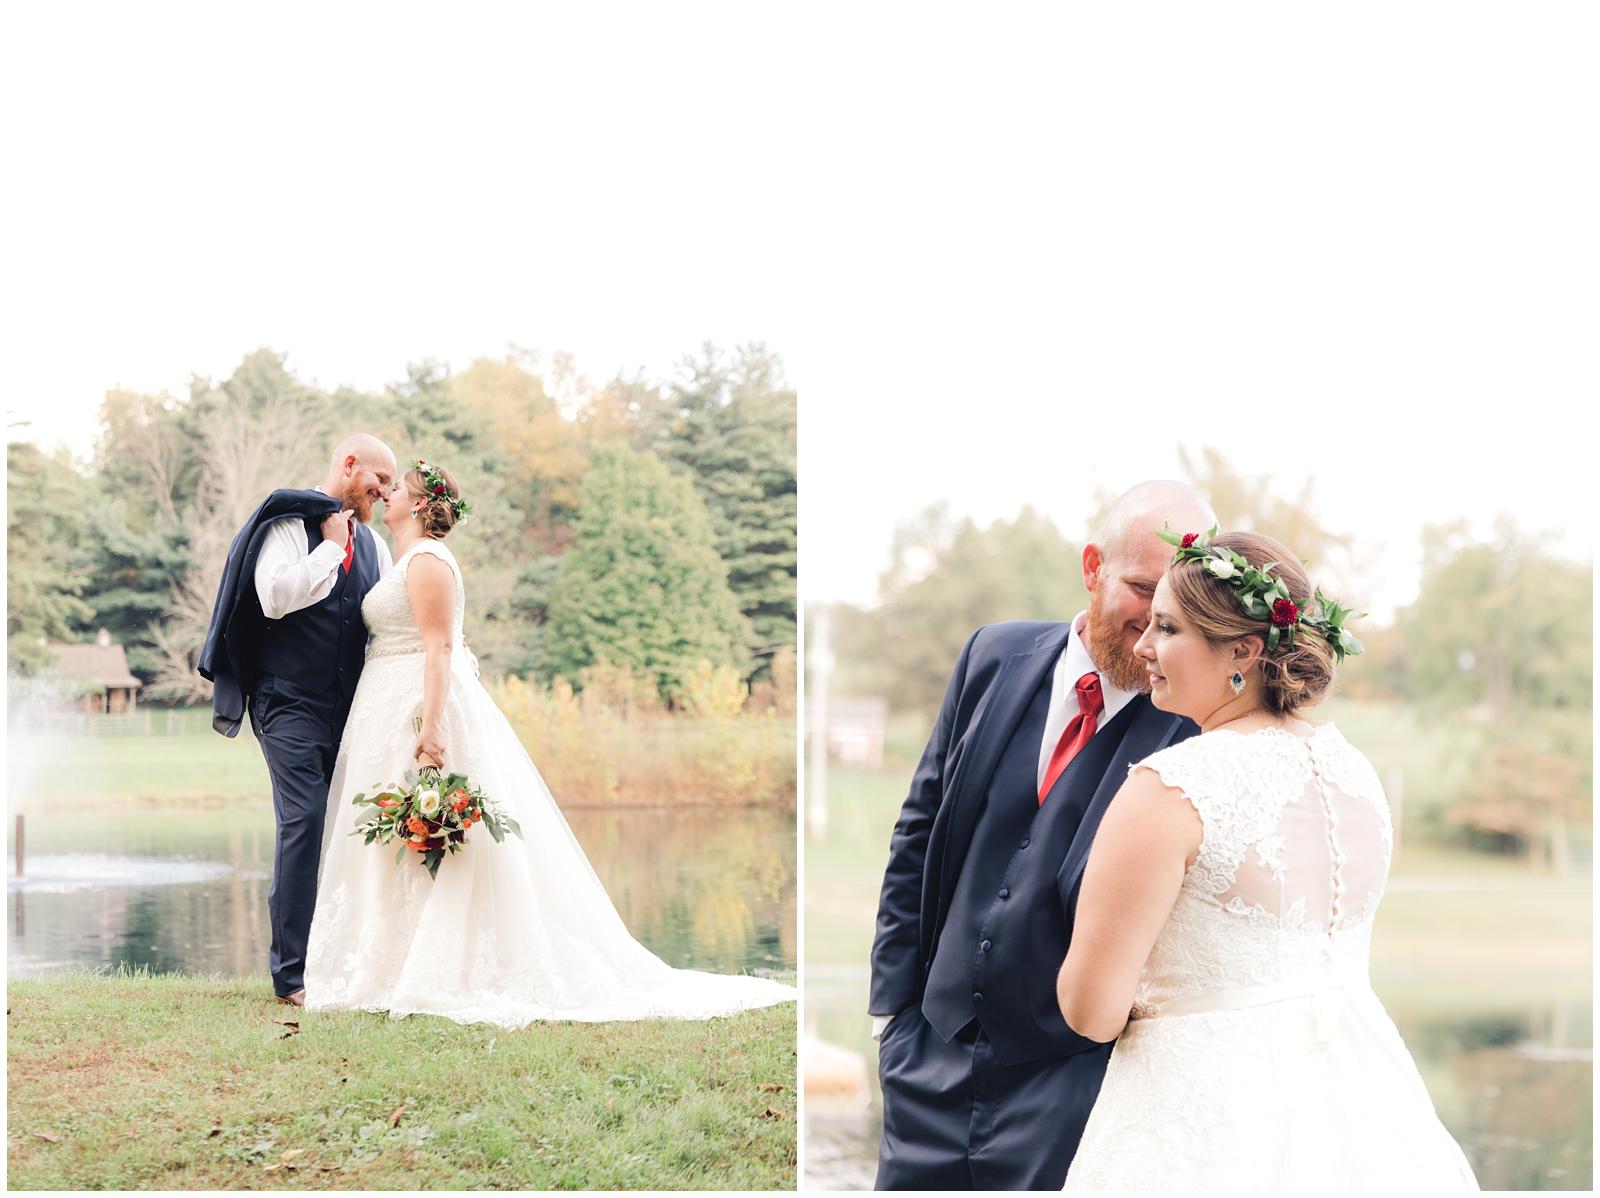 lancaster-ohio-fall-wedding-lra-photo_0018.jpg